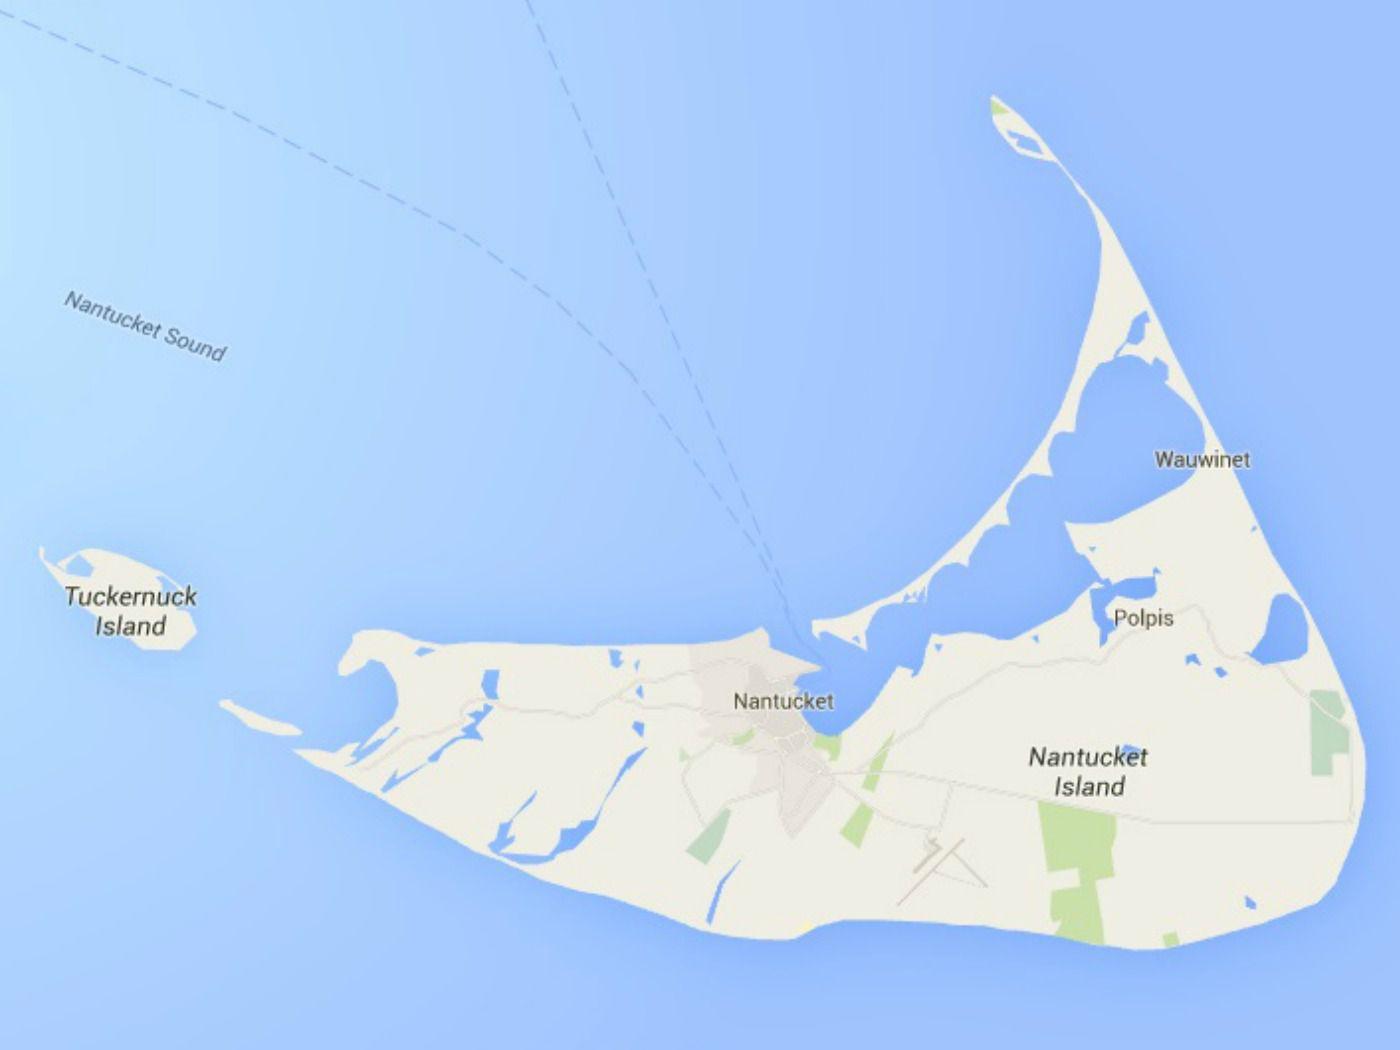 Maps of Cape Cod, Martha's Vineyard, and Nantucket Map Nantucket on new england map, nantucket photos, nantucket real estate, charles river map, cape cod map, hawaii map, flights to nantucket, hyannis map, suffolk county map, long island map, nantucket hotels, united states map, nantucket airlines, west indies map, nantucket tourism, maine map, martha's vineyard map, town of nantucket, north carolina map, newport map, block island map, plymouth map, connecticut shore map, boston map, nantucket vacation rentals, south carolina map, massachusetts map, nantucket.net, hudson ma on map, billingsgate island map, nantucket attractions, nantucket guide,